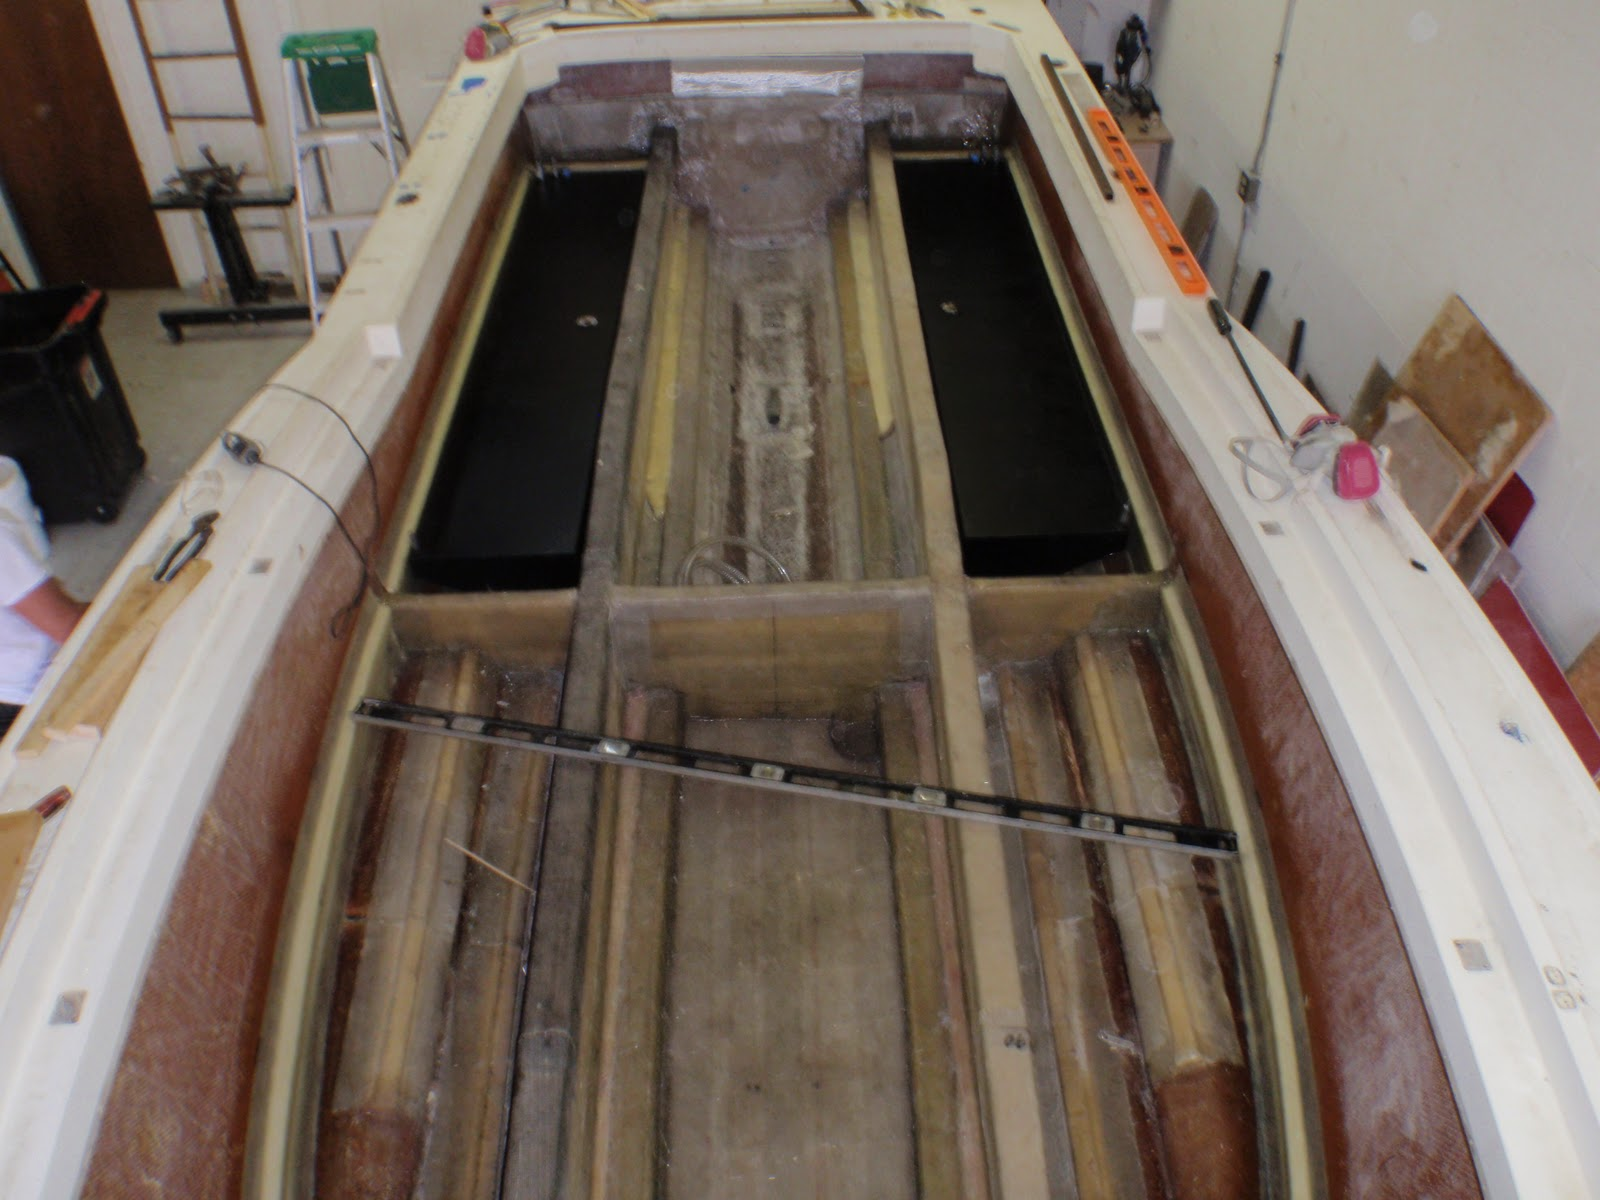 1981 23 Fish Nautique Restoration All Ahead Full On The